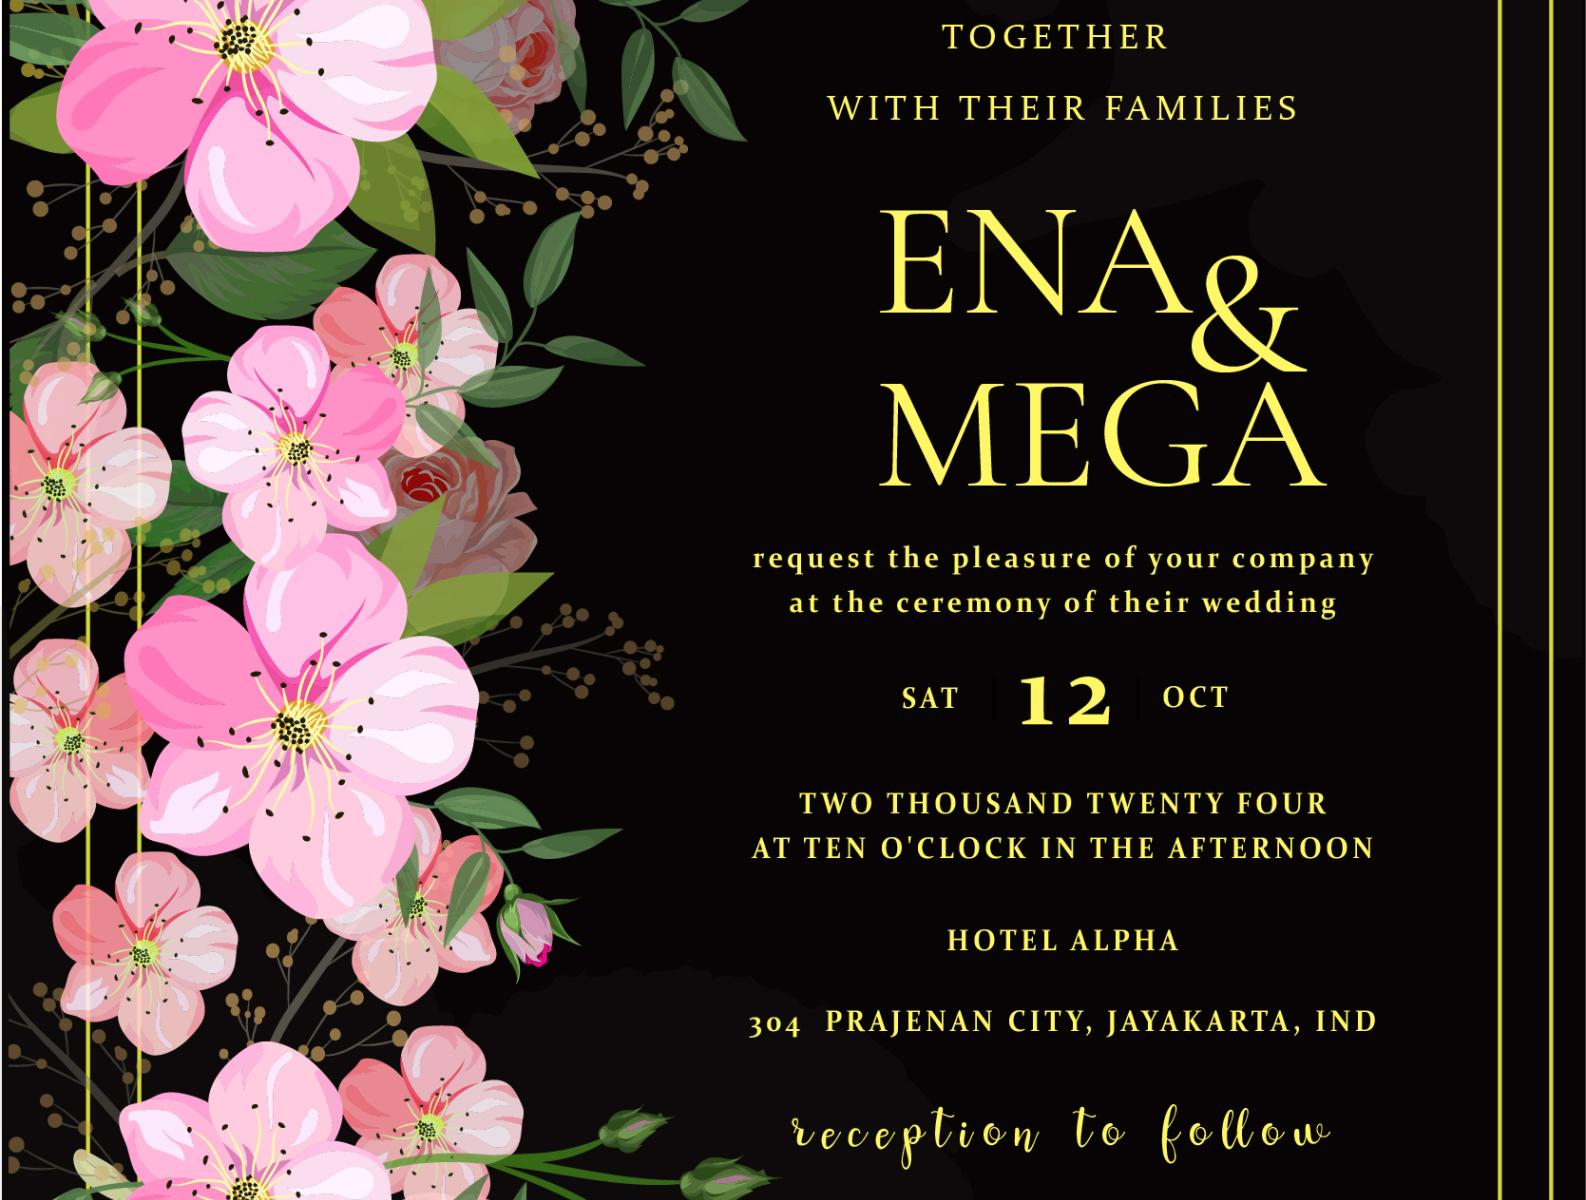 Wedding Invitation Card Background By Daniel Ena On Dribbble